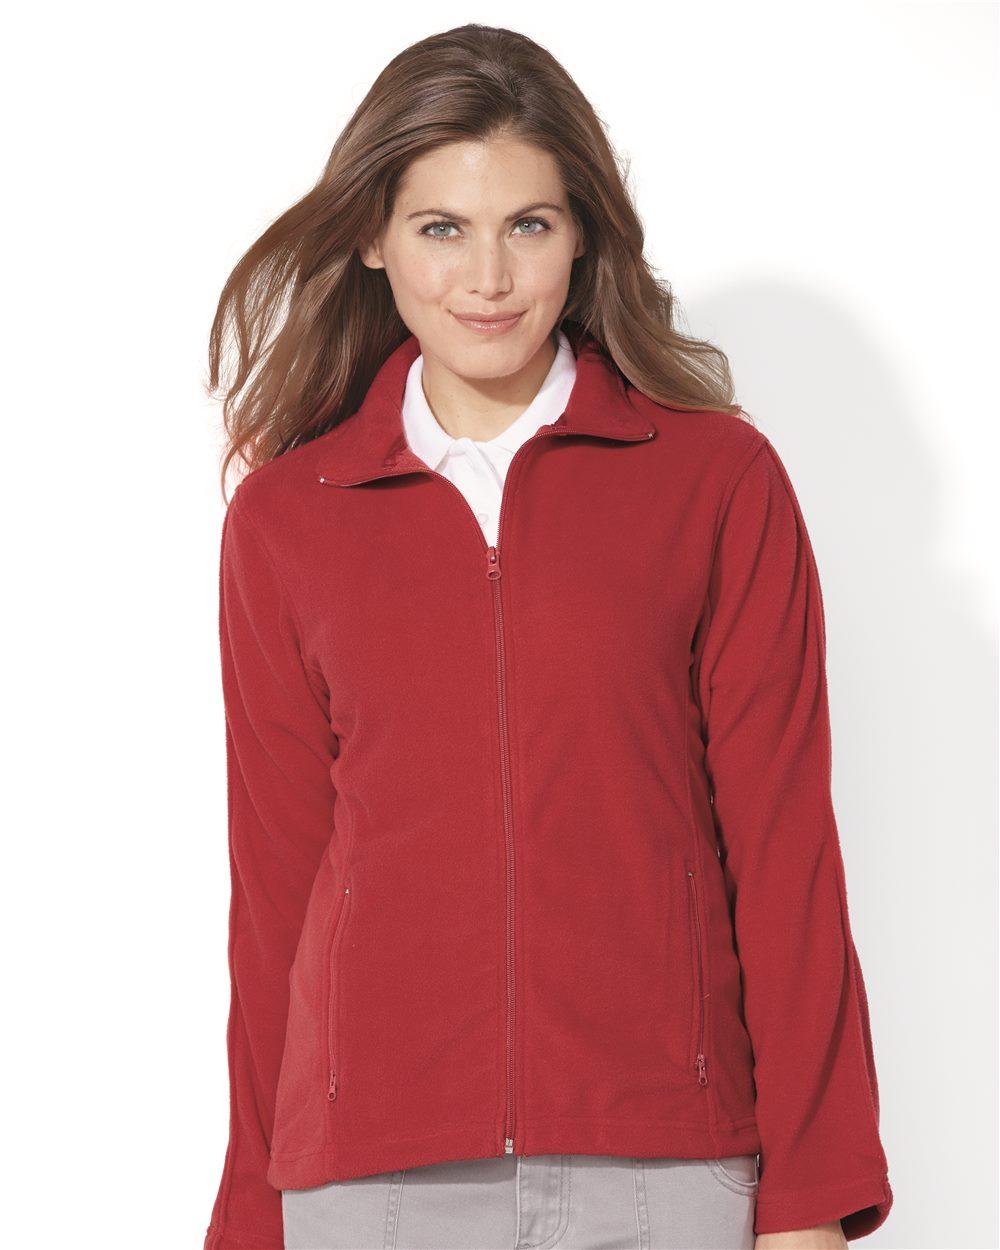 FeatherLite 5301 - Ladies' Moisture Resistant Micro Fleece Jacket